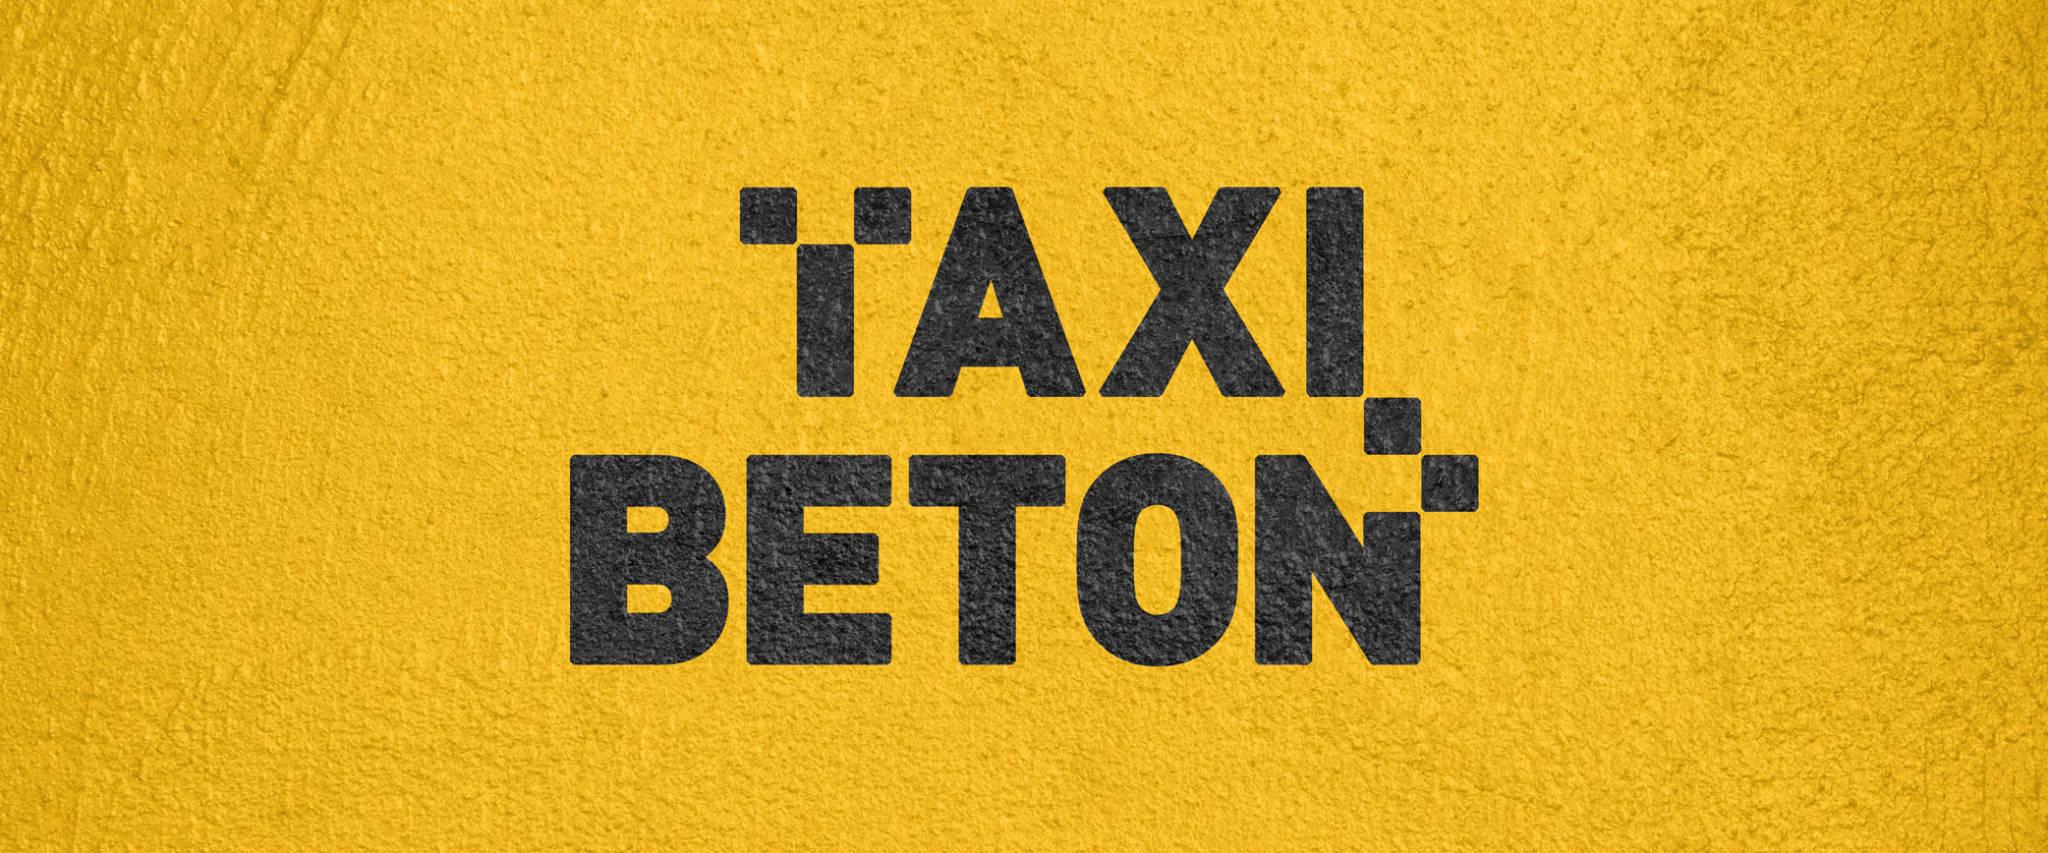 TaxiBeton